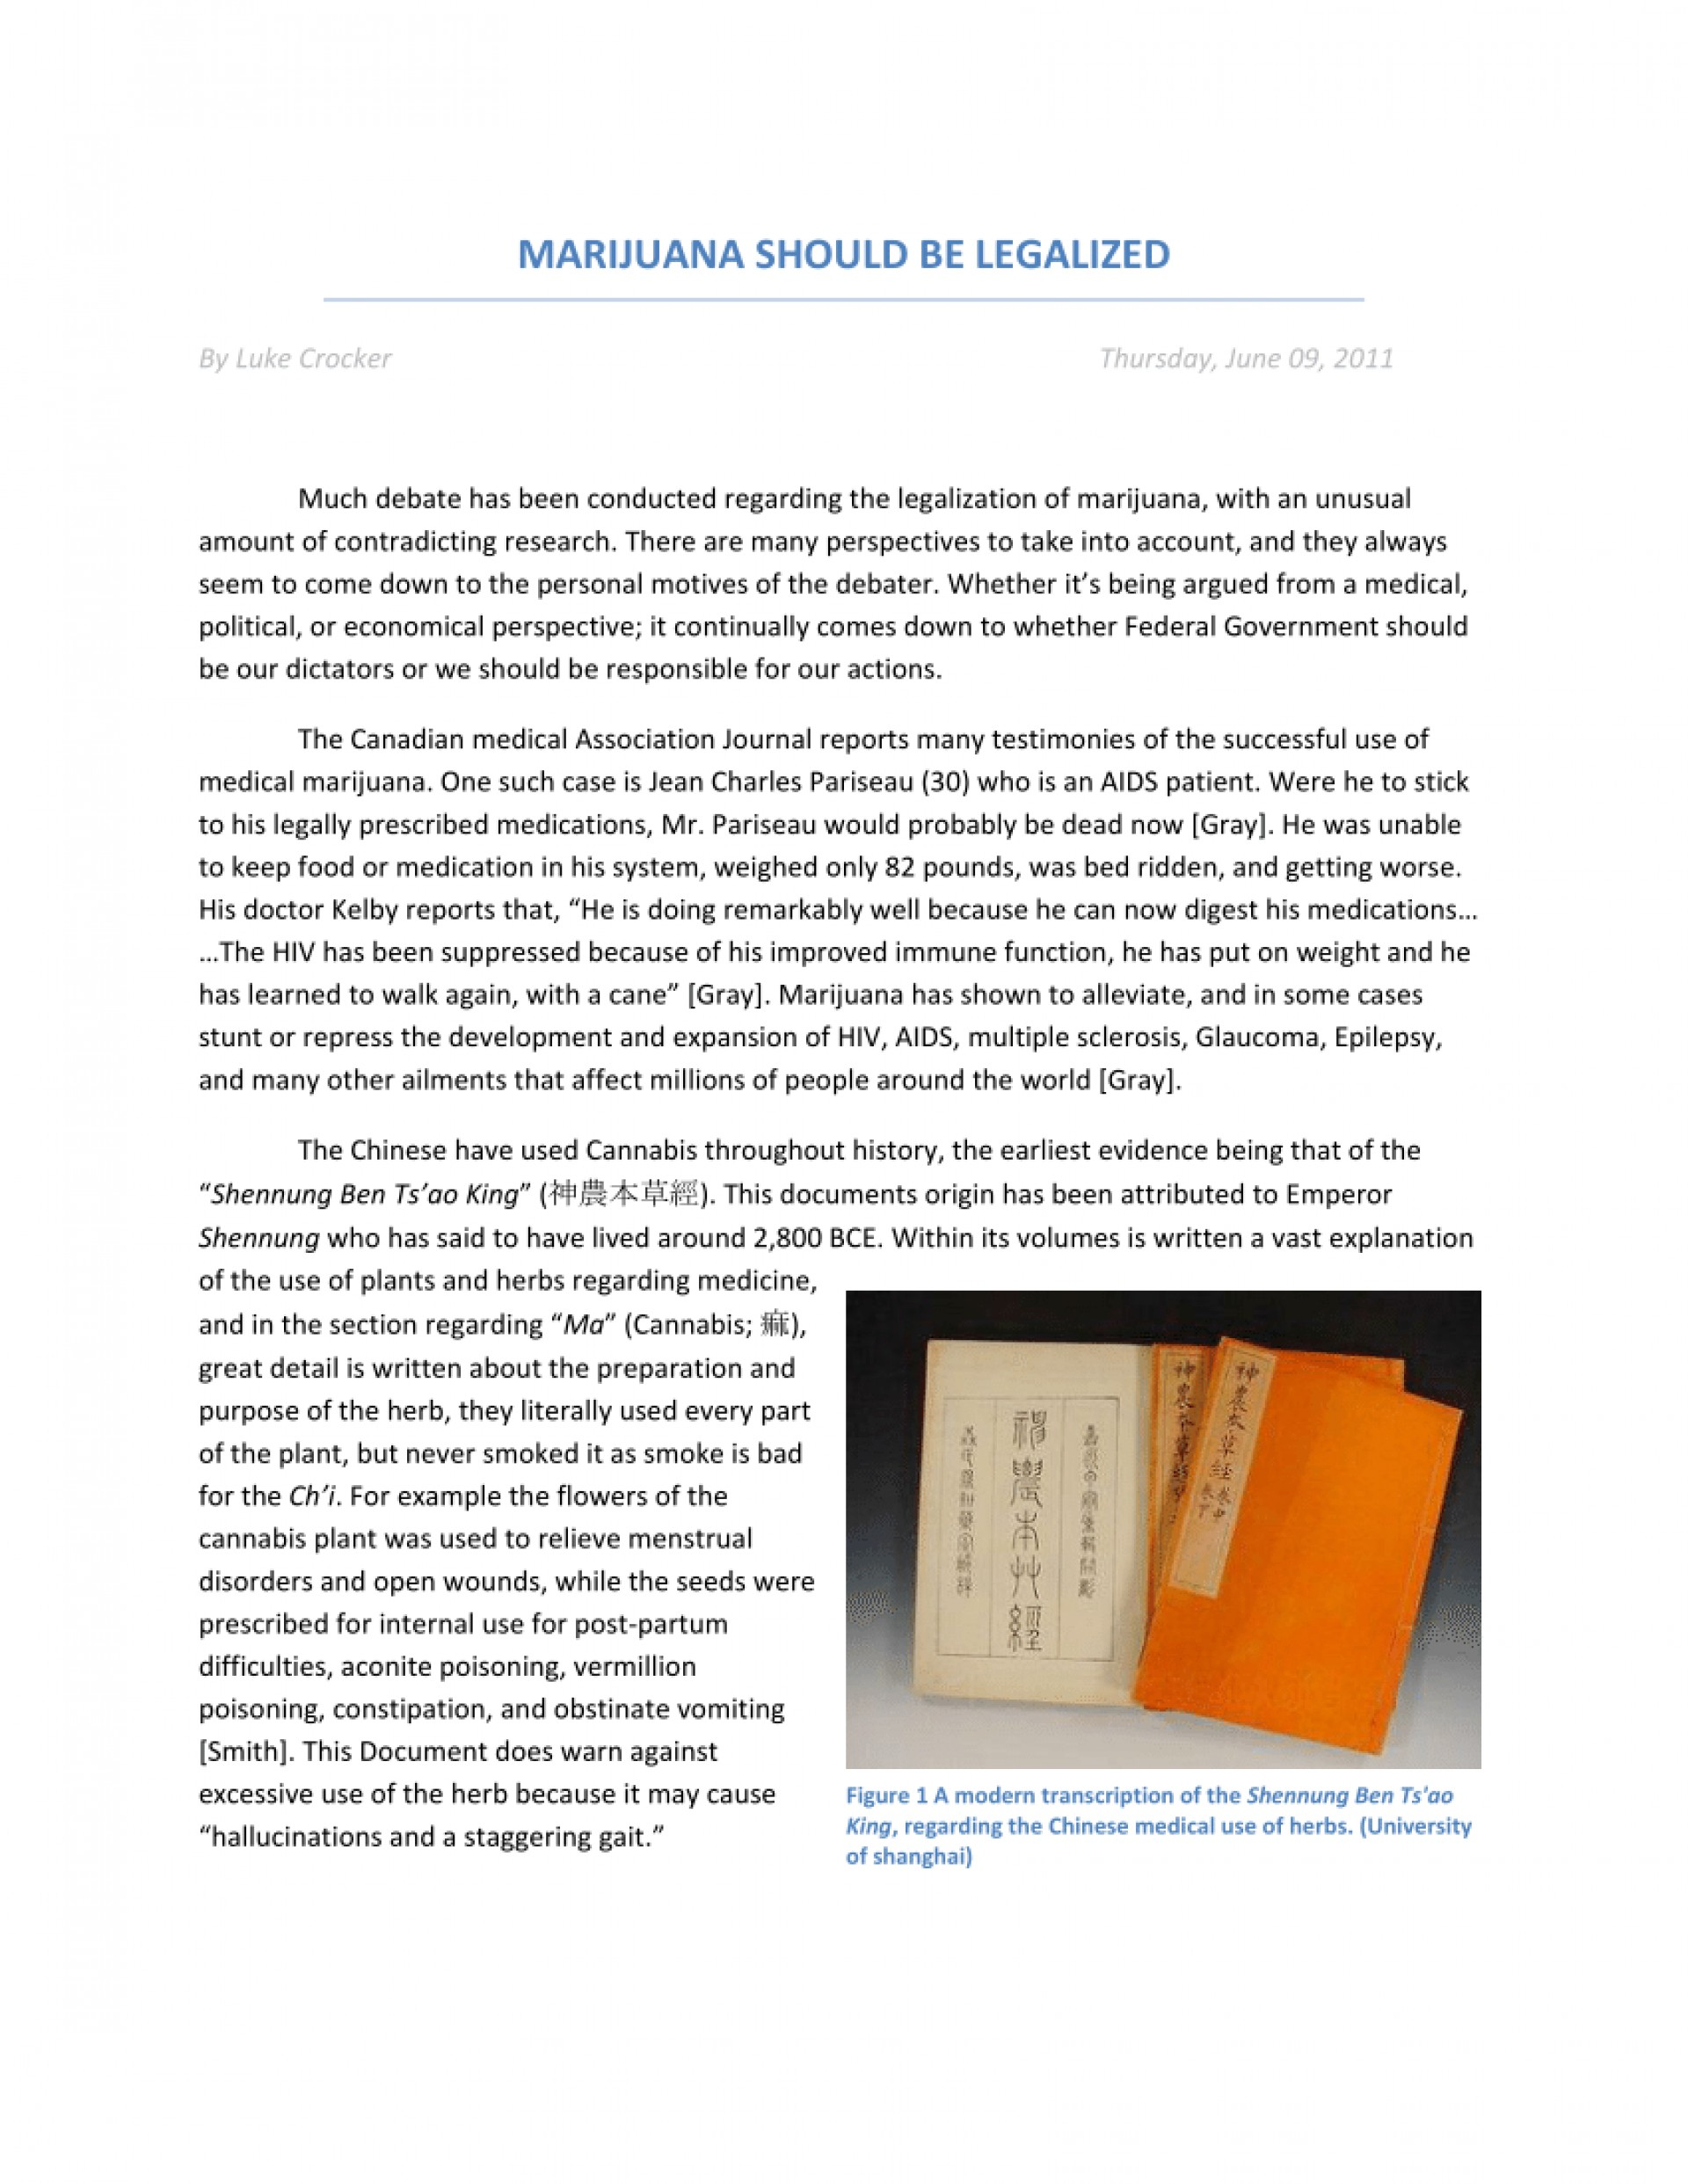 005 Largepreview Marijuana Argumentative Essay Unforgettable Legalization Of Example Persuasive Outline Topics 1920